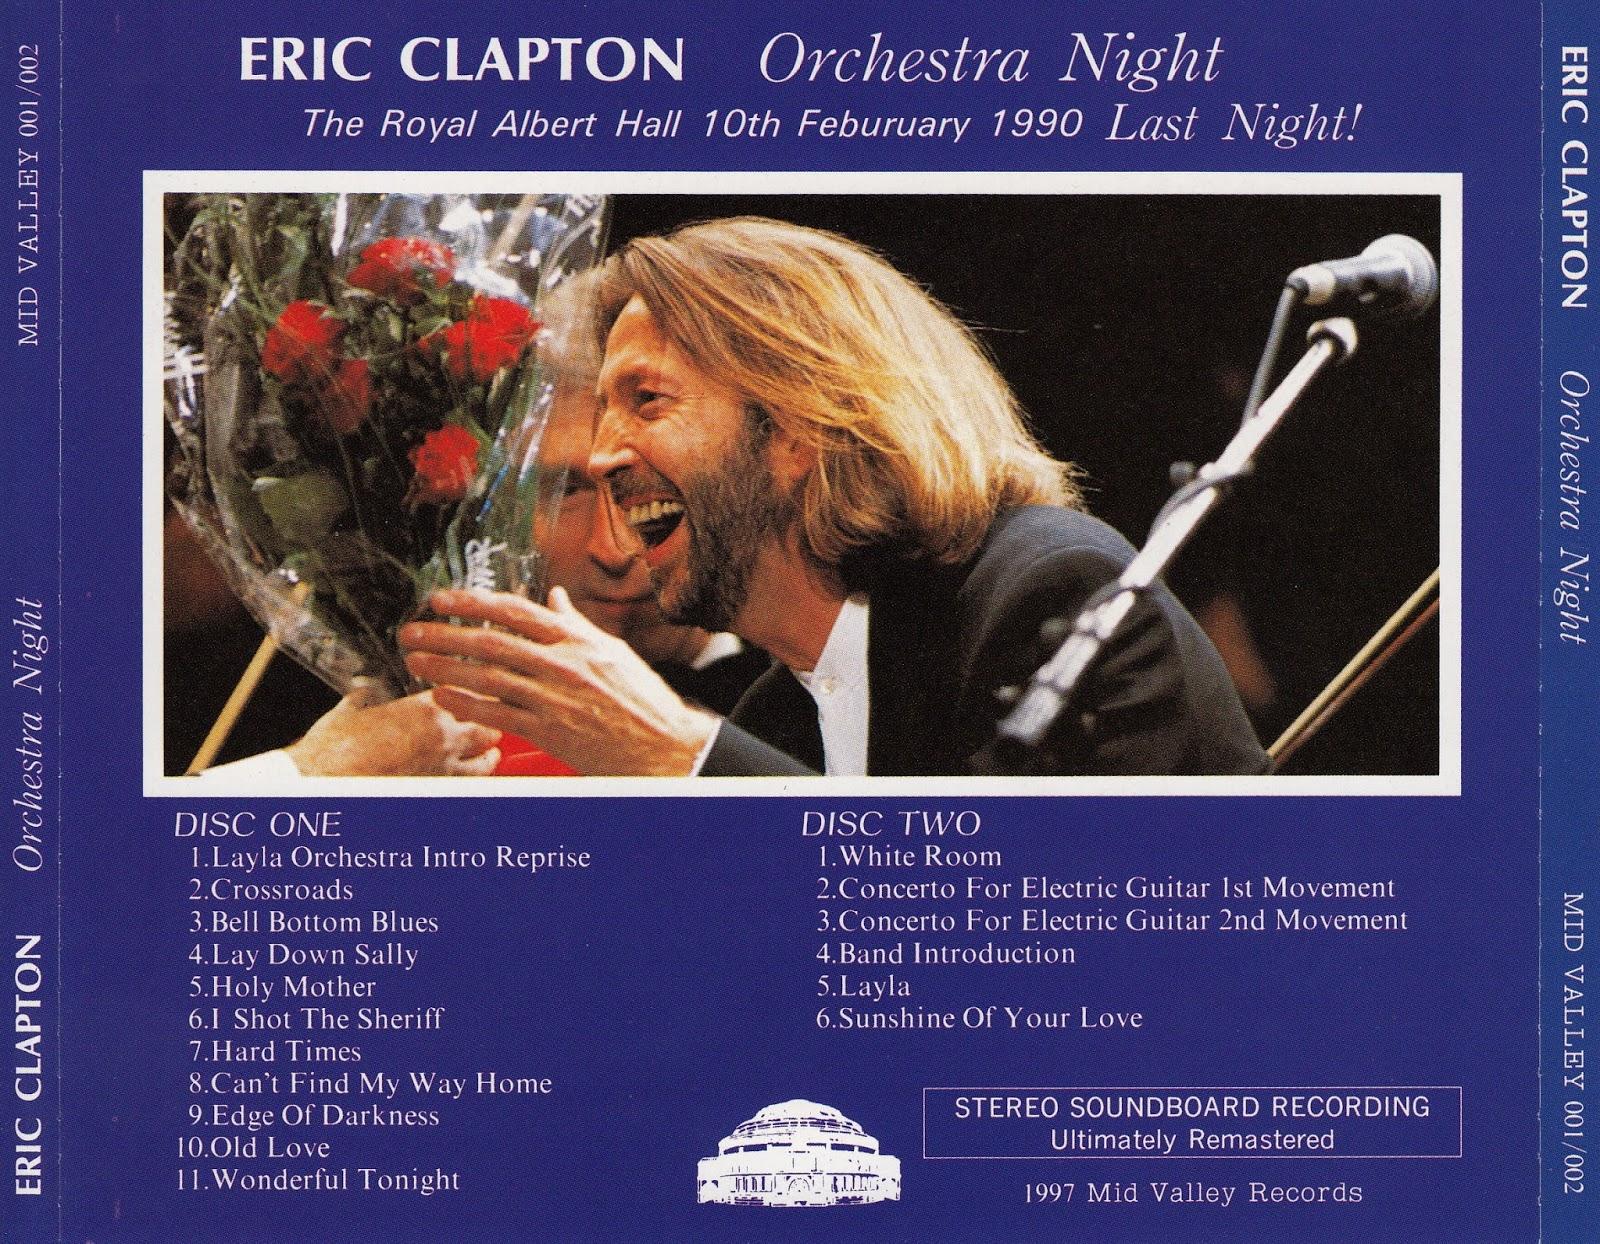 World Of Bootlegs Bootleg Eric Clapton Orchestra